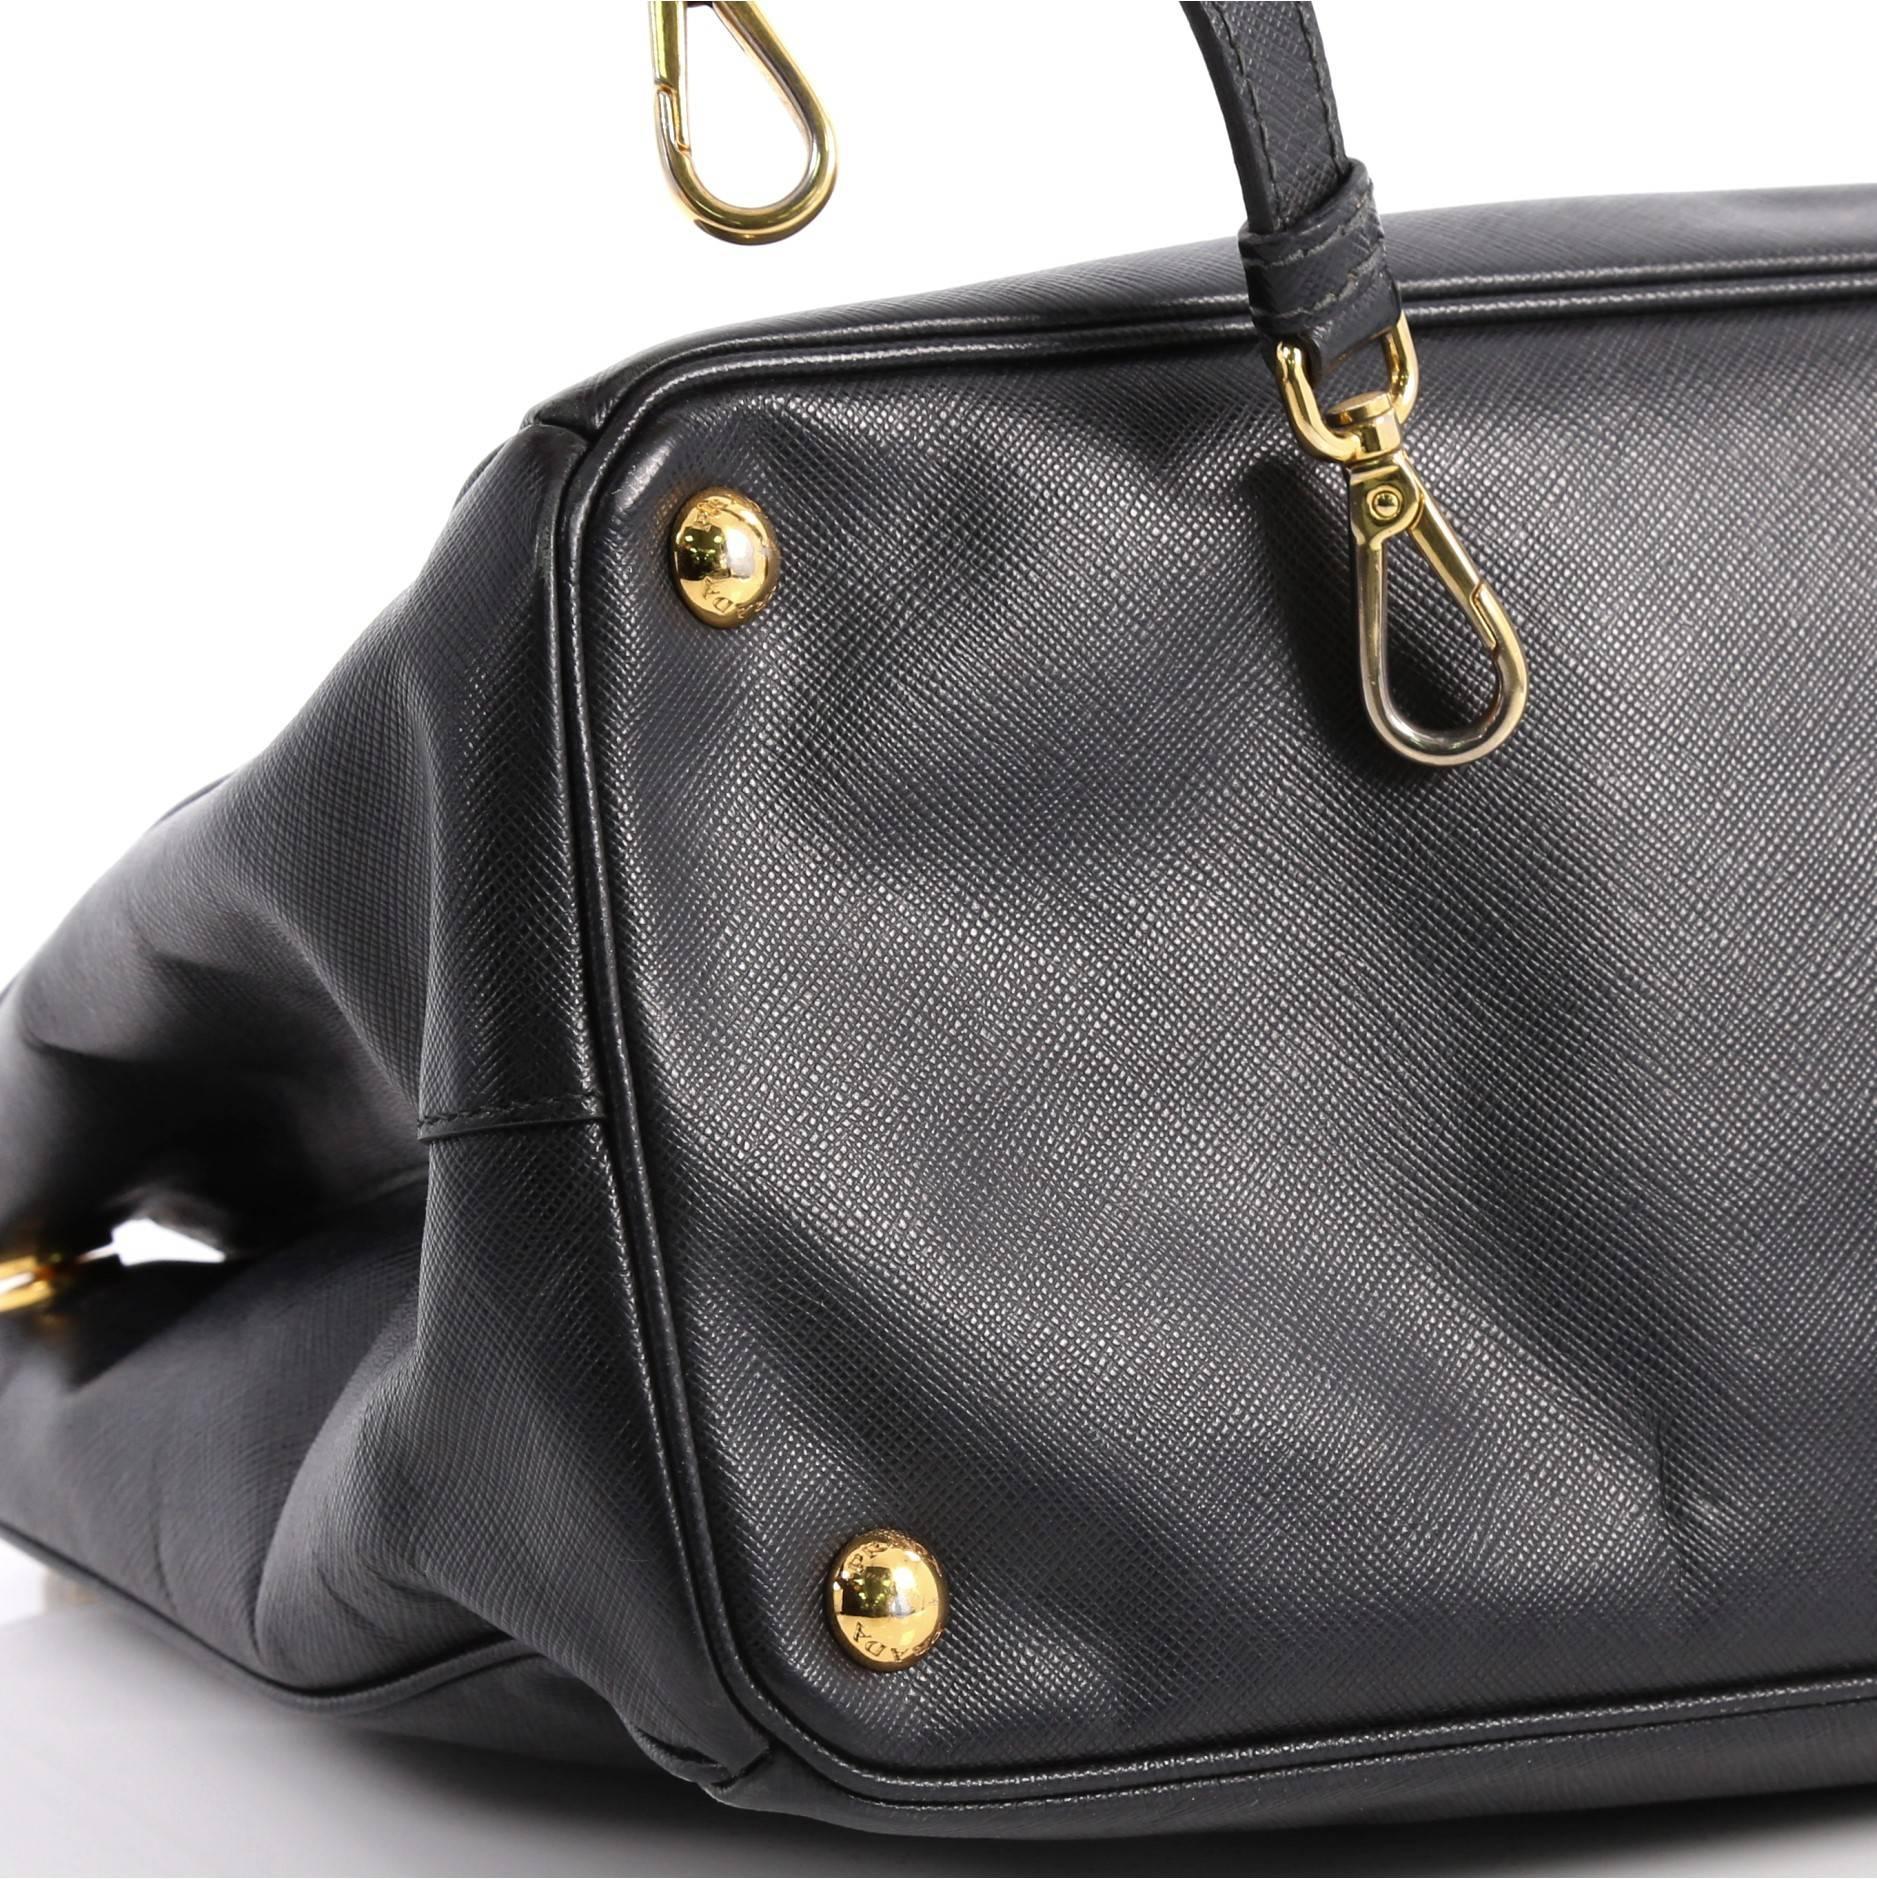 1b413d1caab5 ... norway prada double zip lux tote saffiano leather medium at 1stdibs  19a93 4b56d